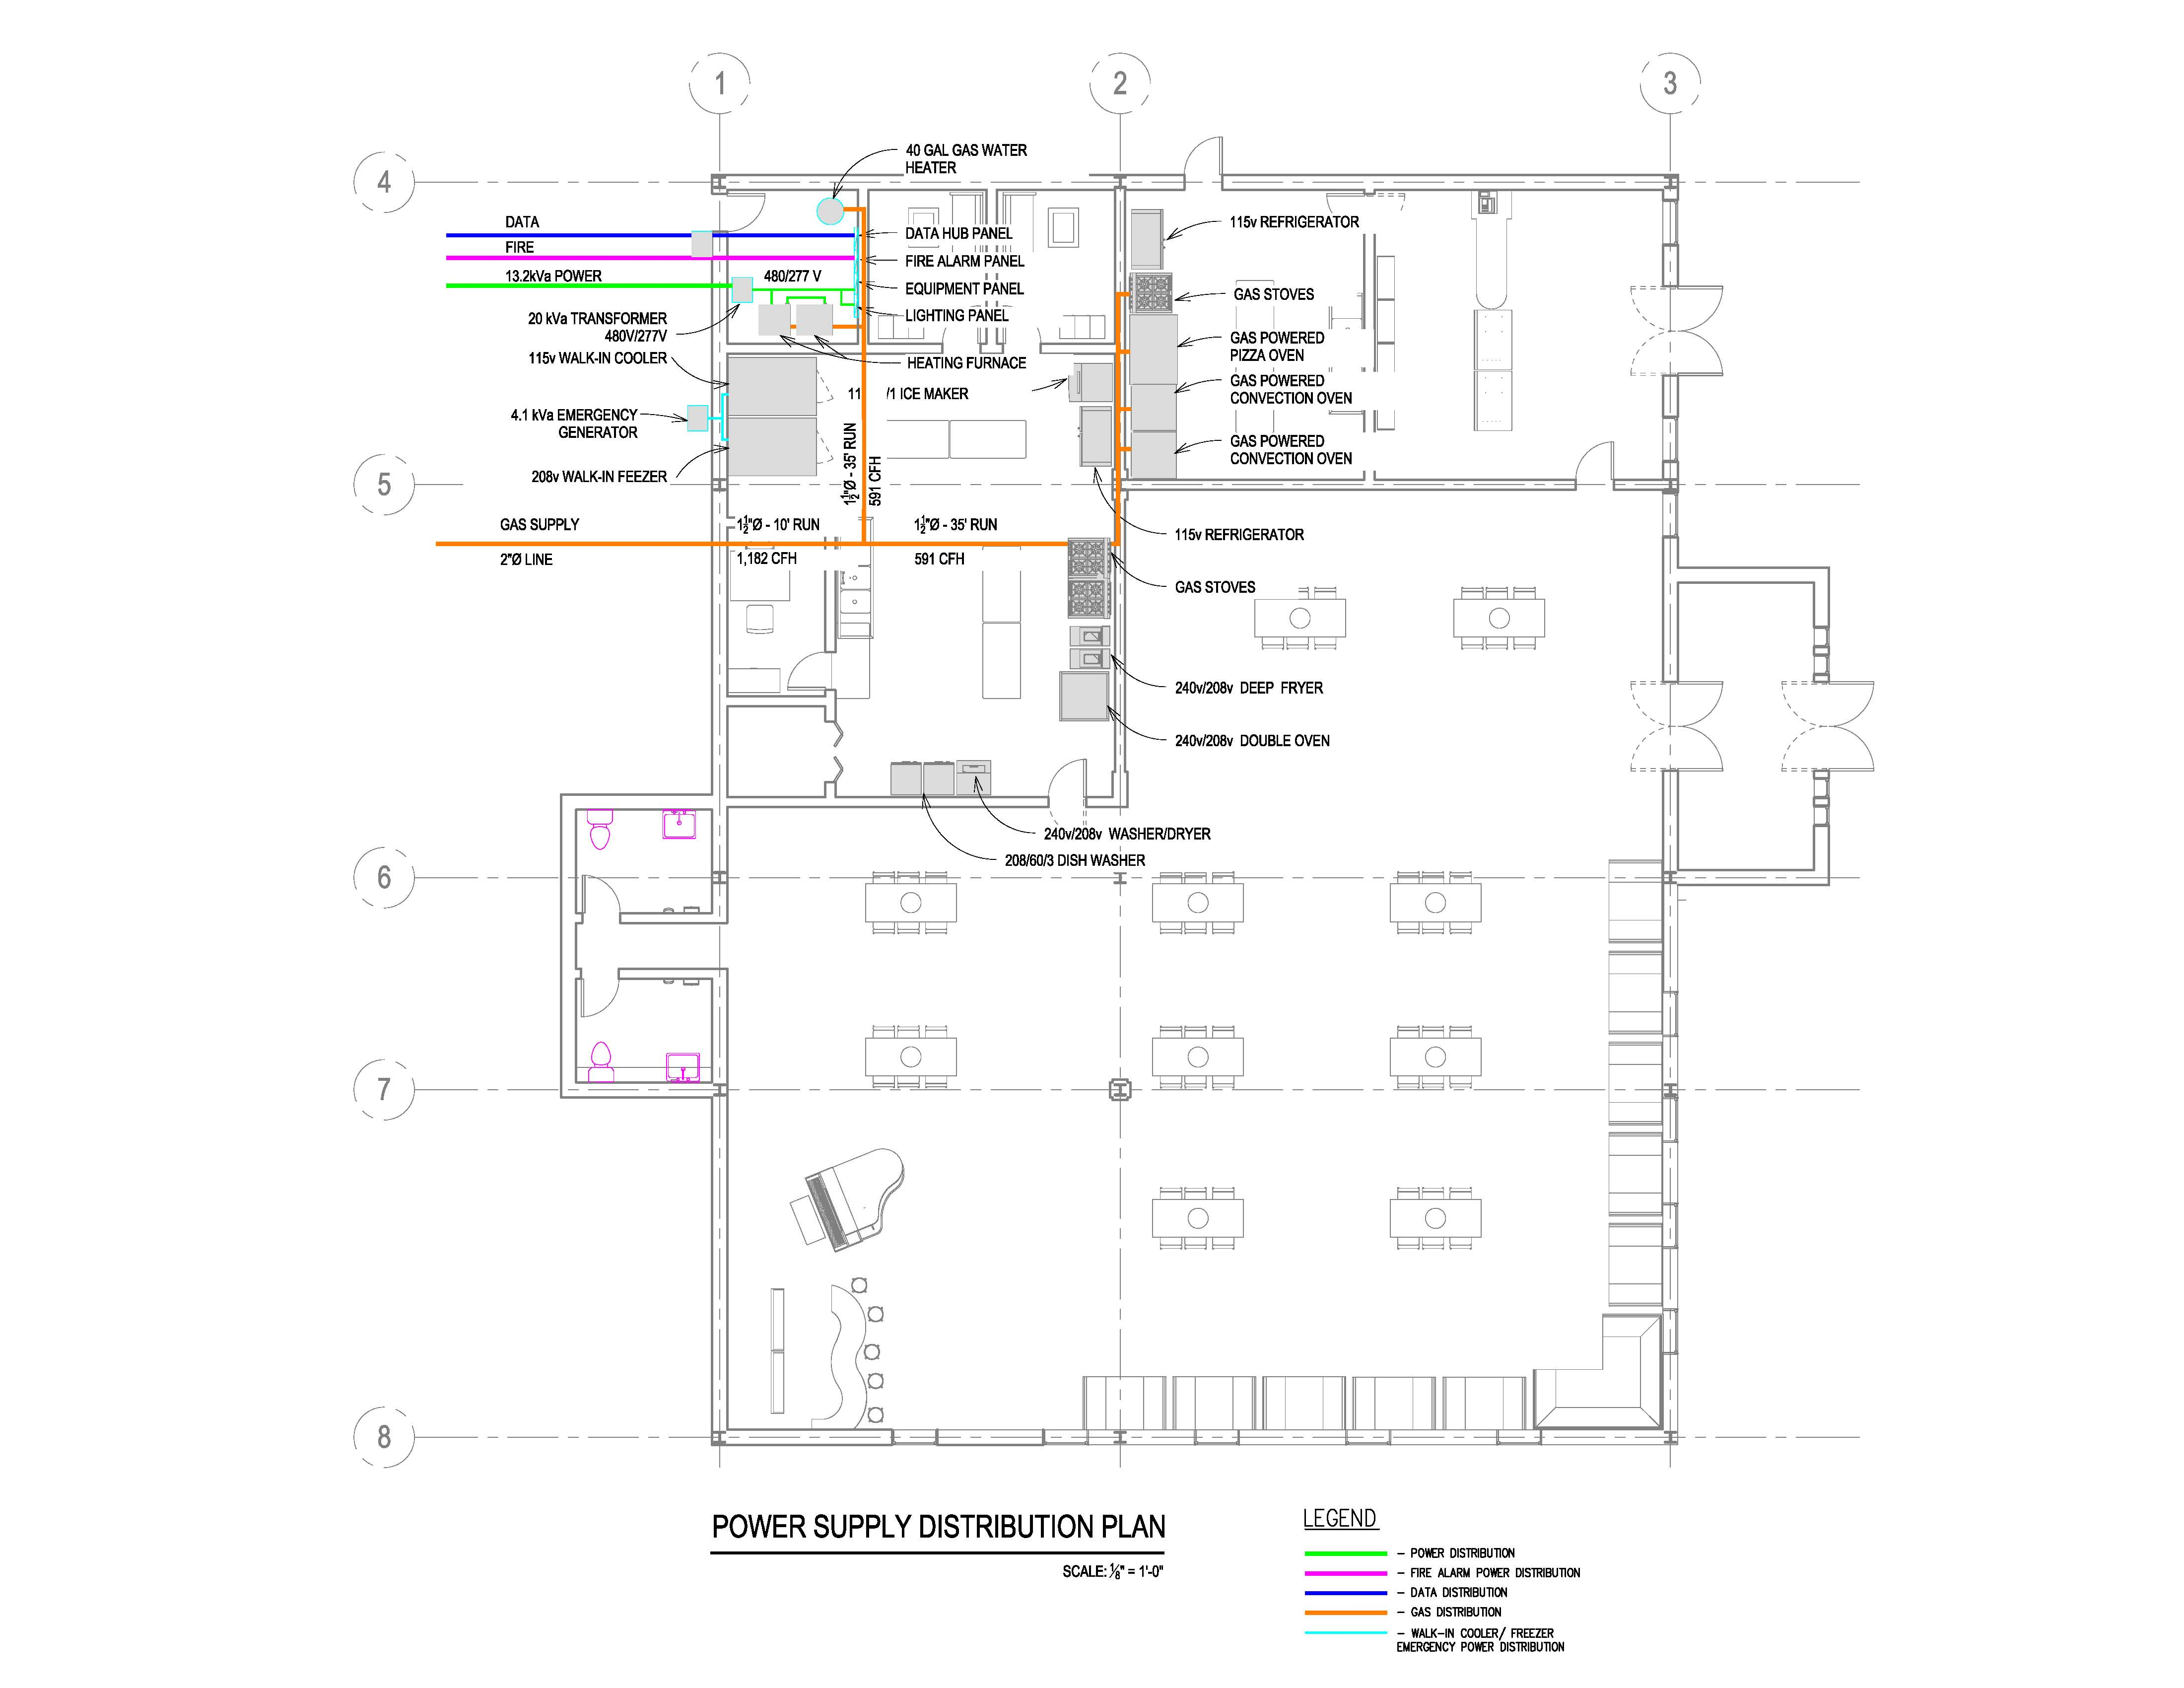 single line diagram of power distribution motor startet nicht electrical diagrams and plumbing design